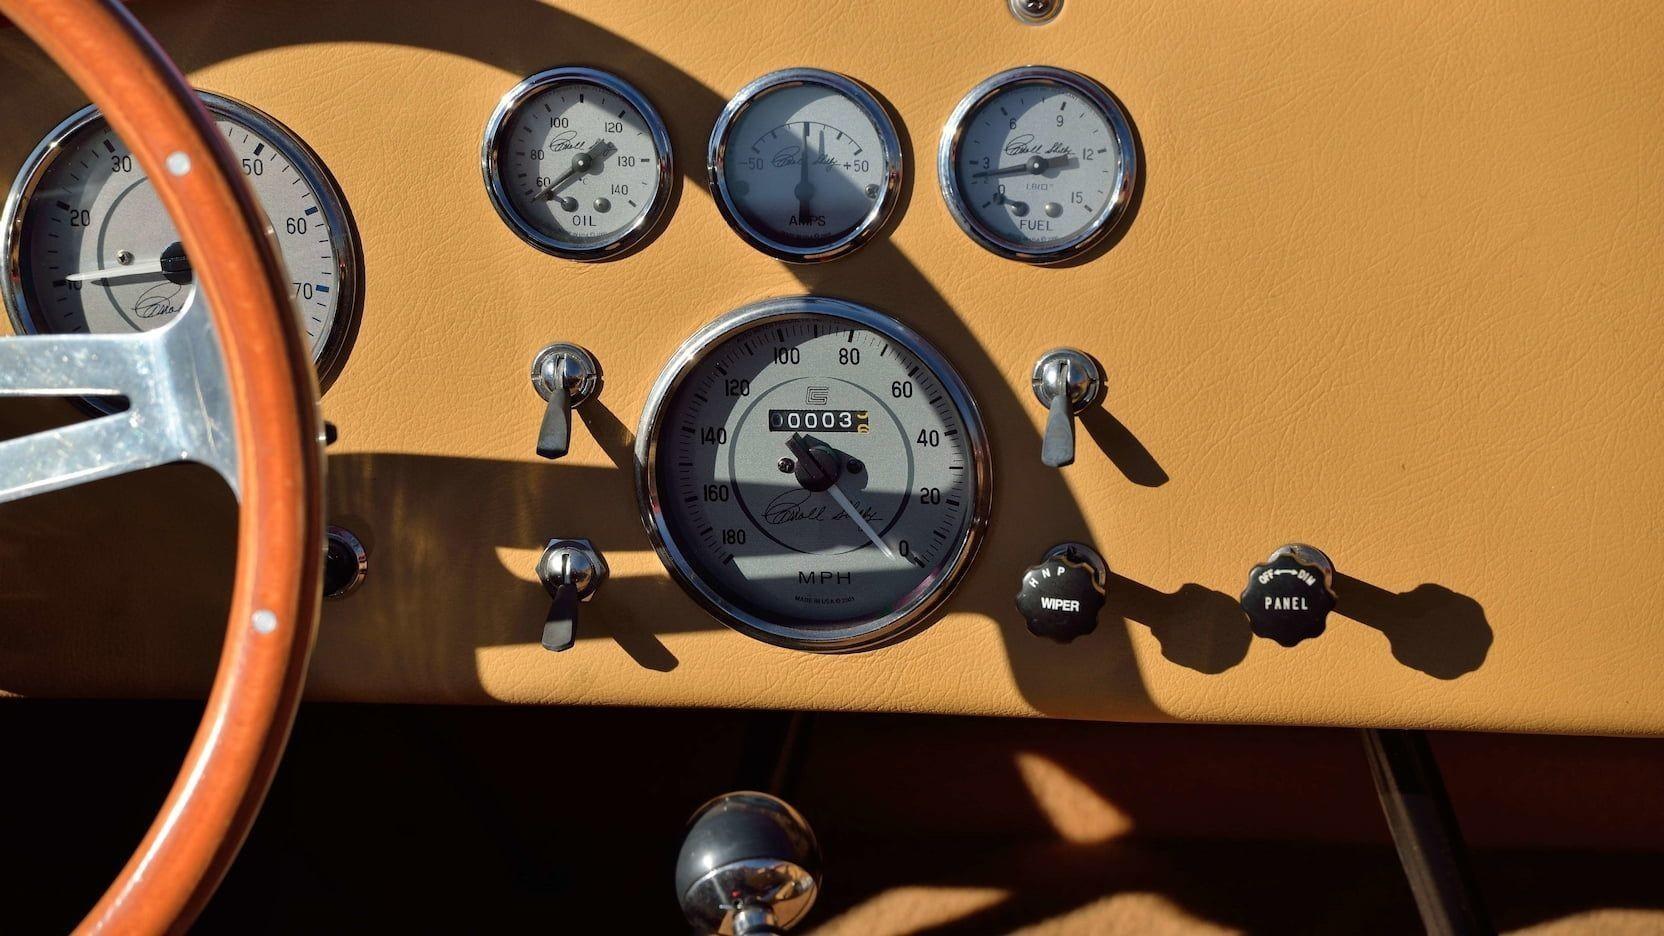 Shelby 427 Cobra FAM 1965 года, принадлежавшая Полу Уокеру